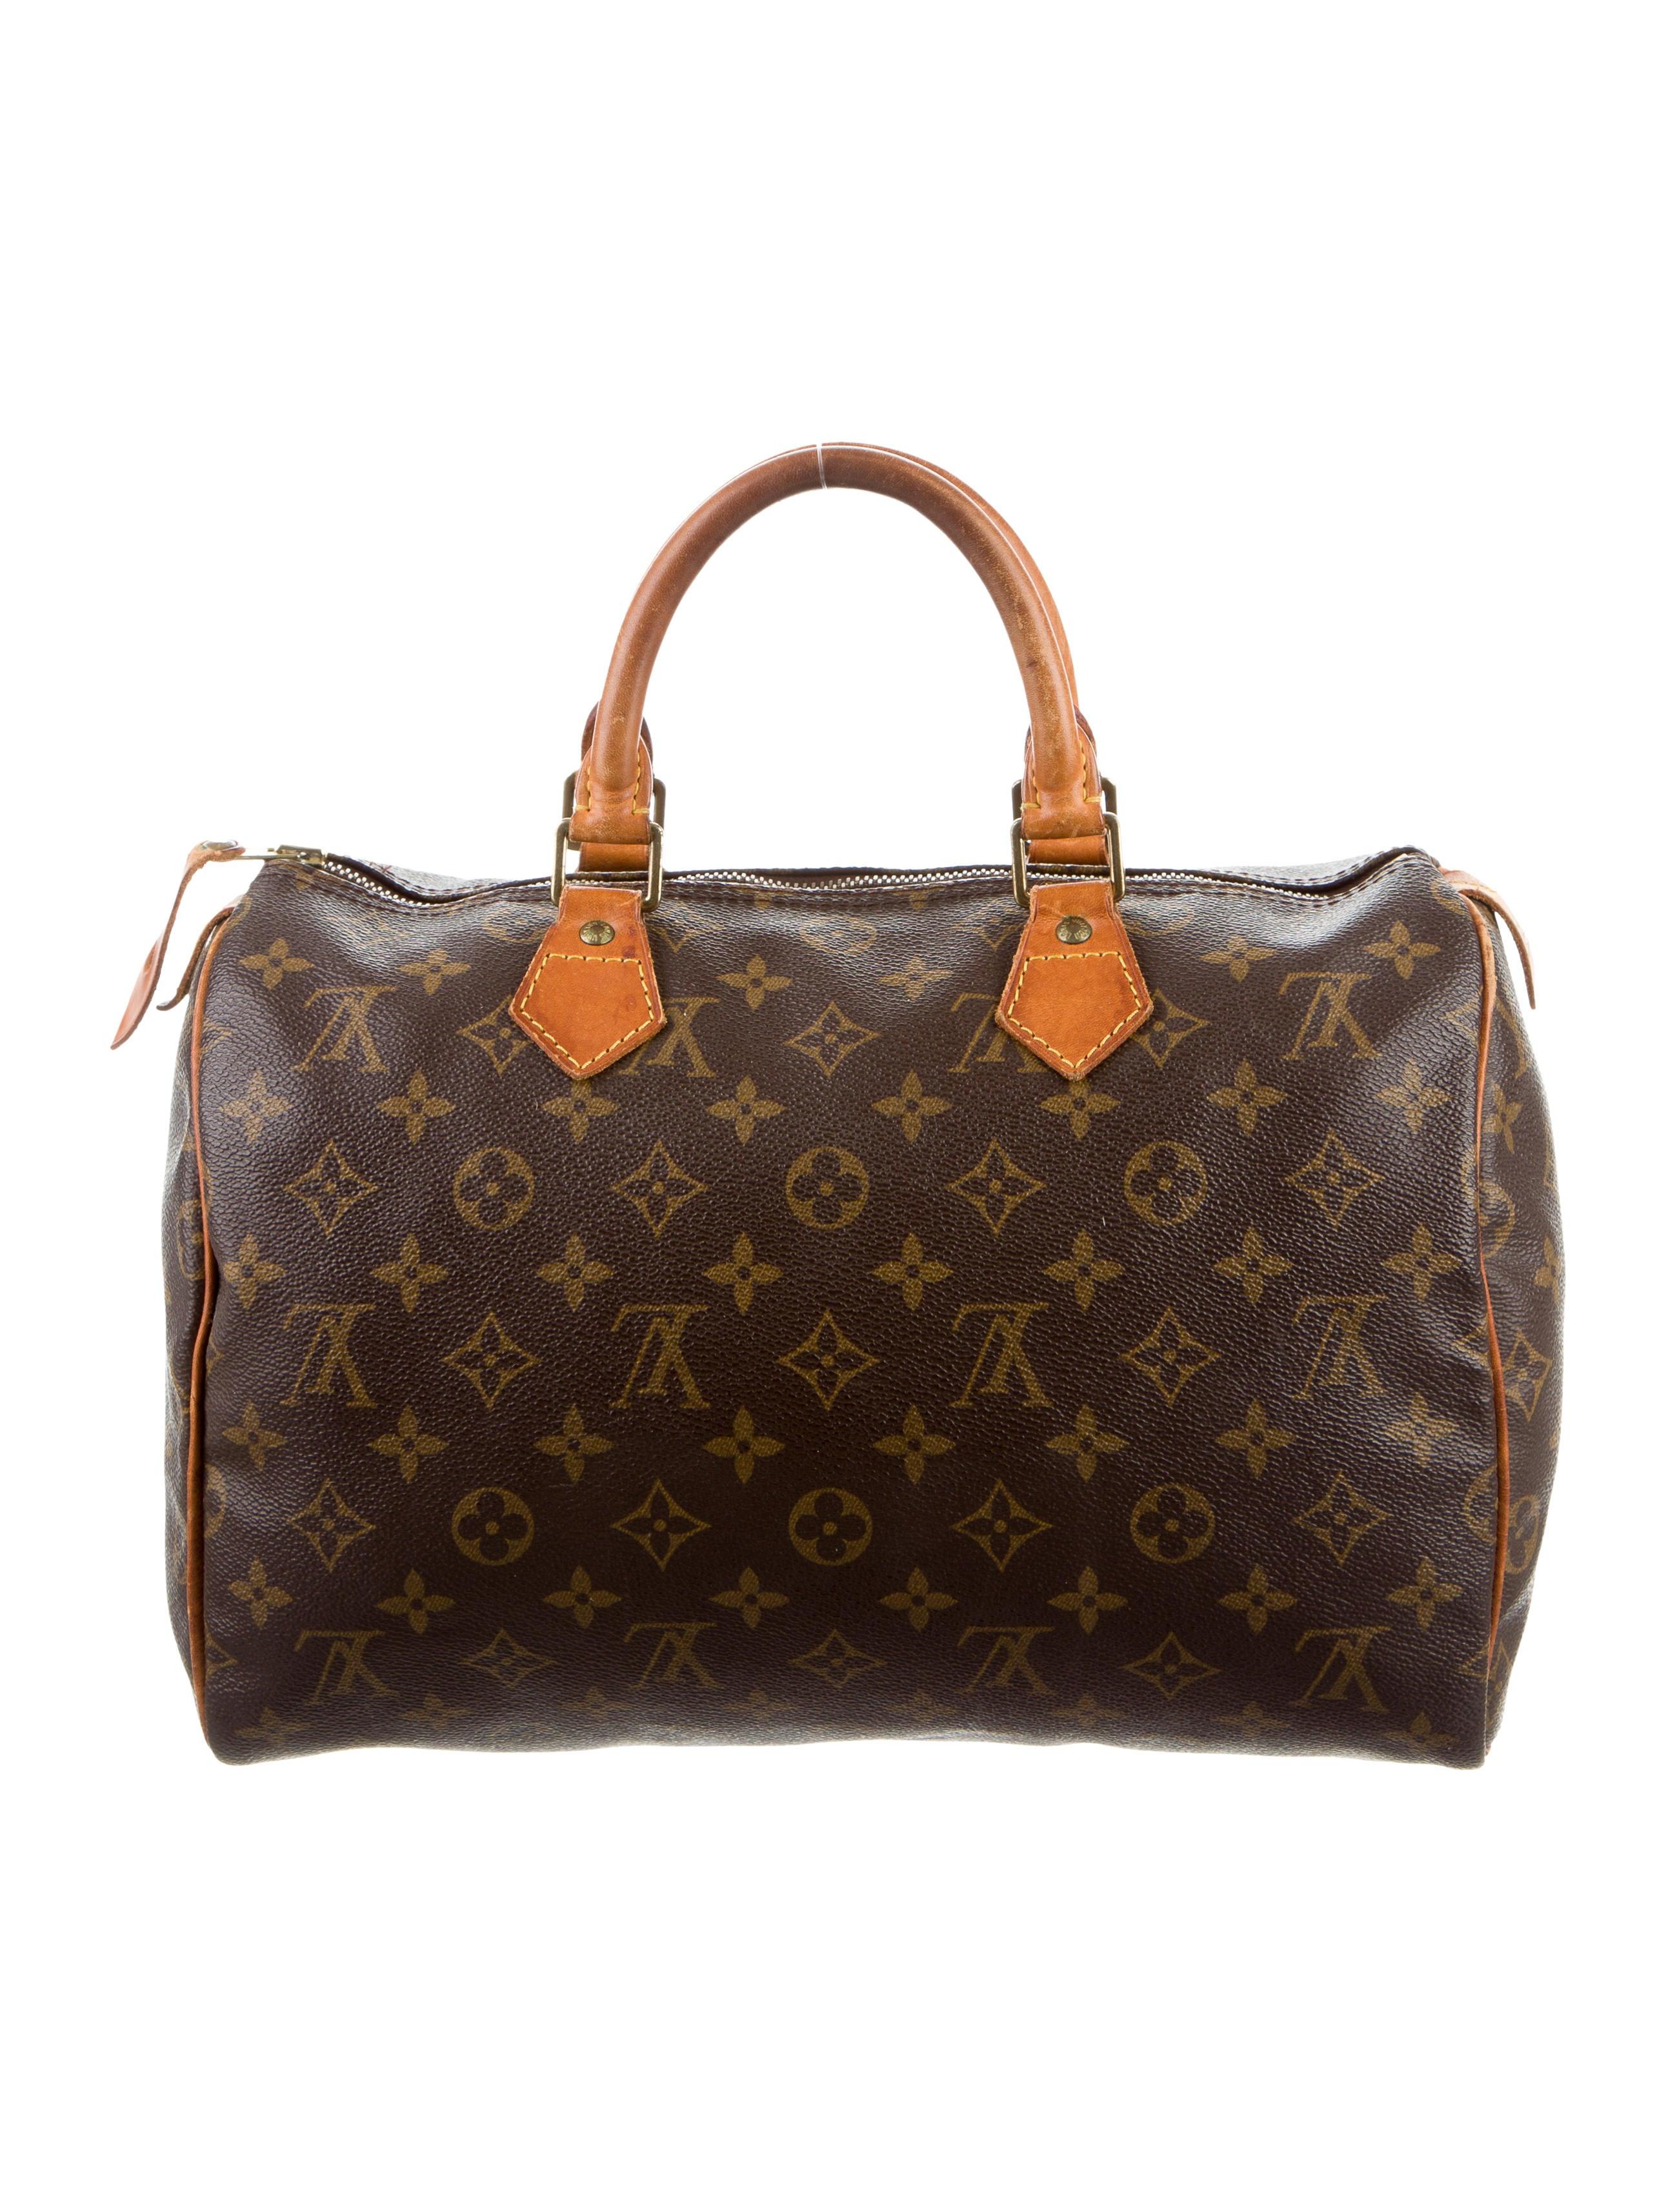 louis vuitton monogram speedy 30 handbags lou109163. Black Bedroom Furniture Sets. Home Design Ideas